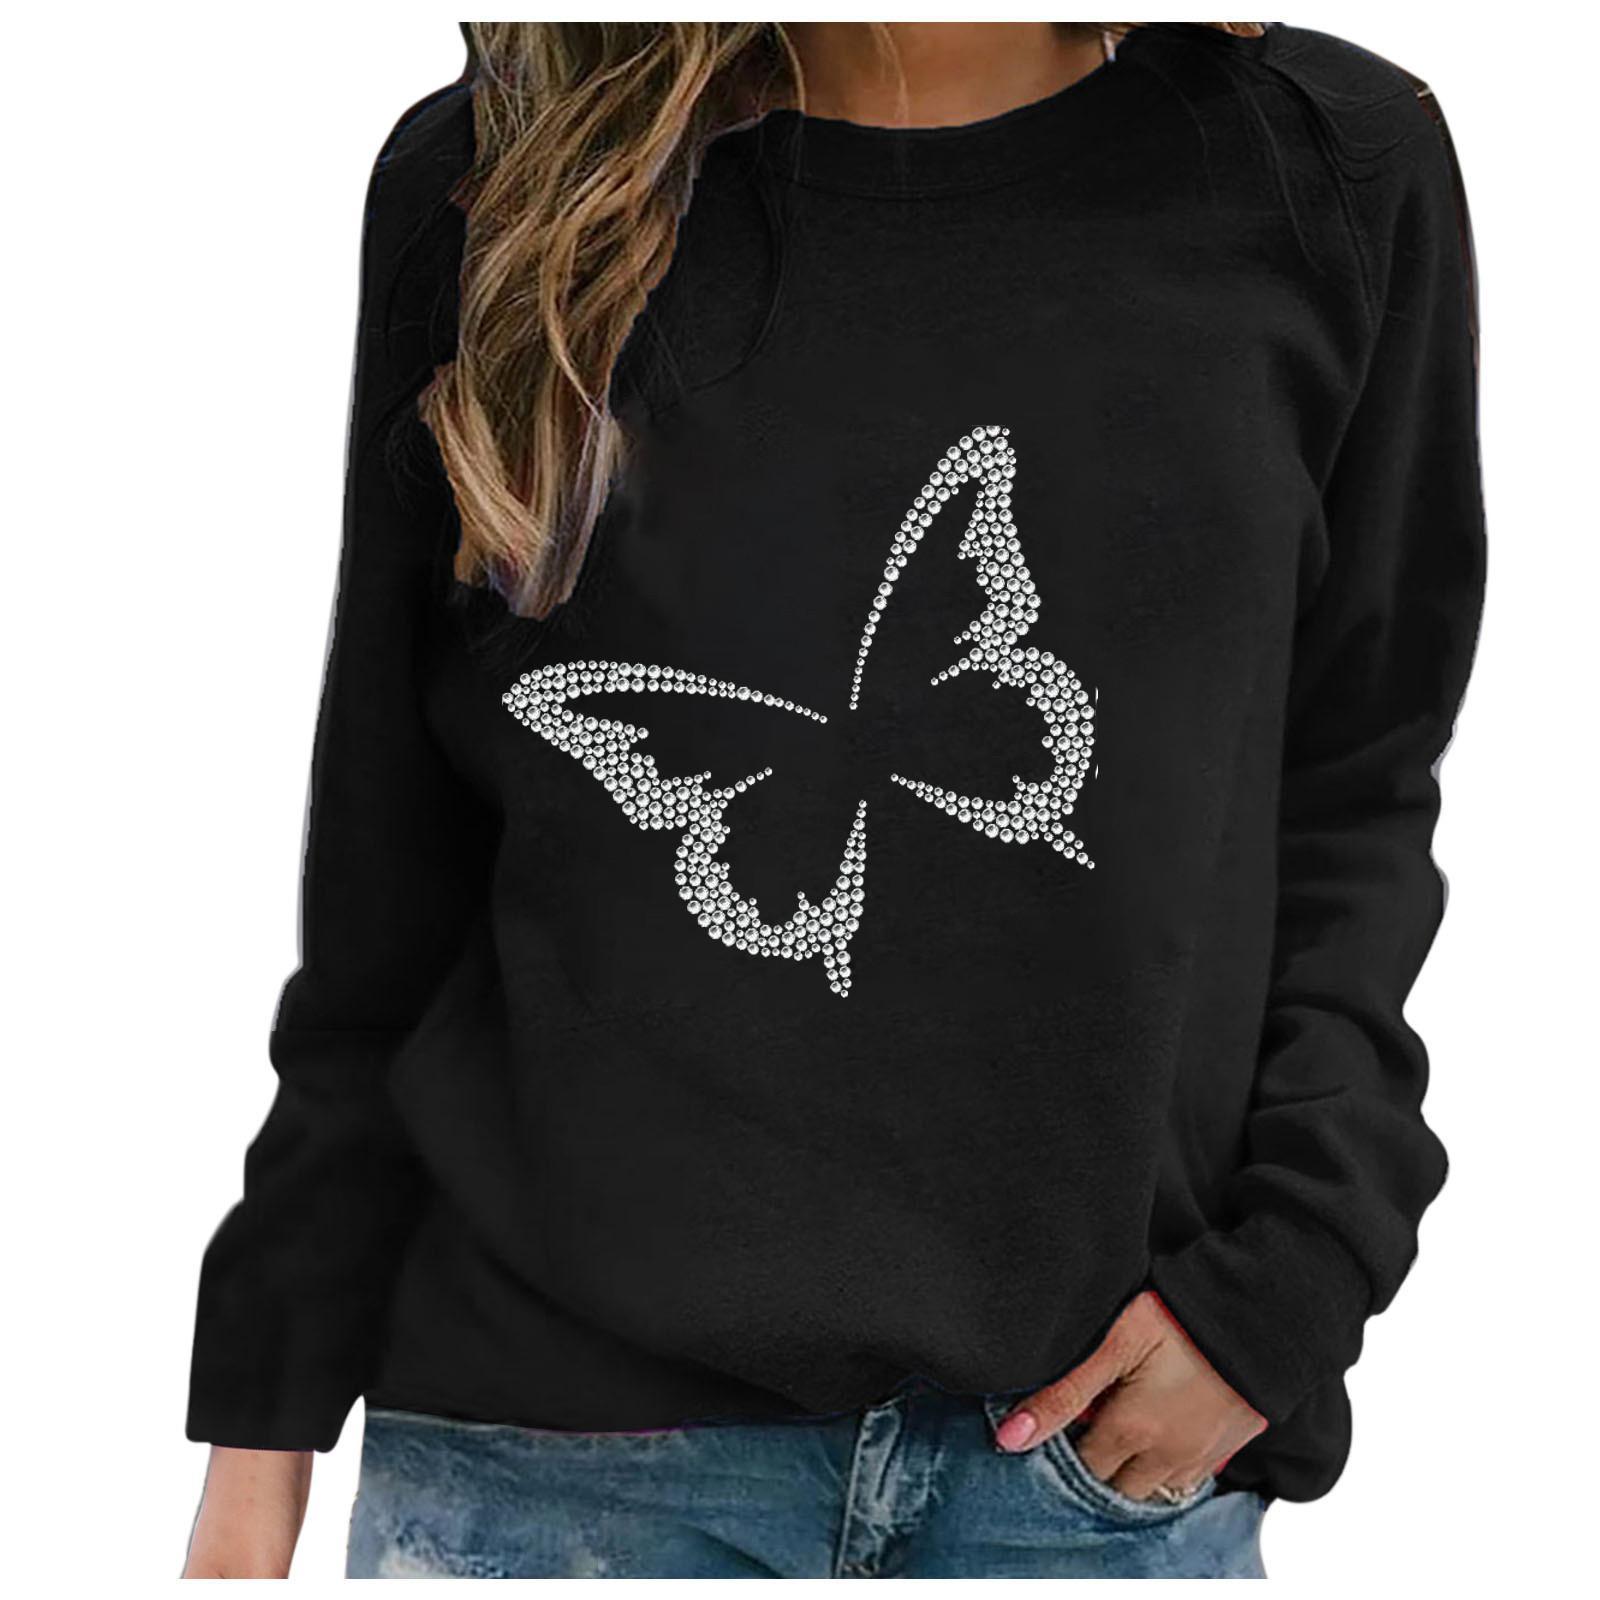 Blusa negra Mujeres de manga larga damas casuales O-cuello mariposa Rhinestone Tops camisa Bluzki Damskie X0521